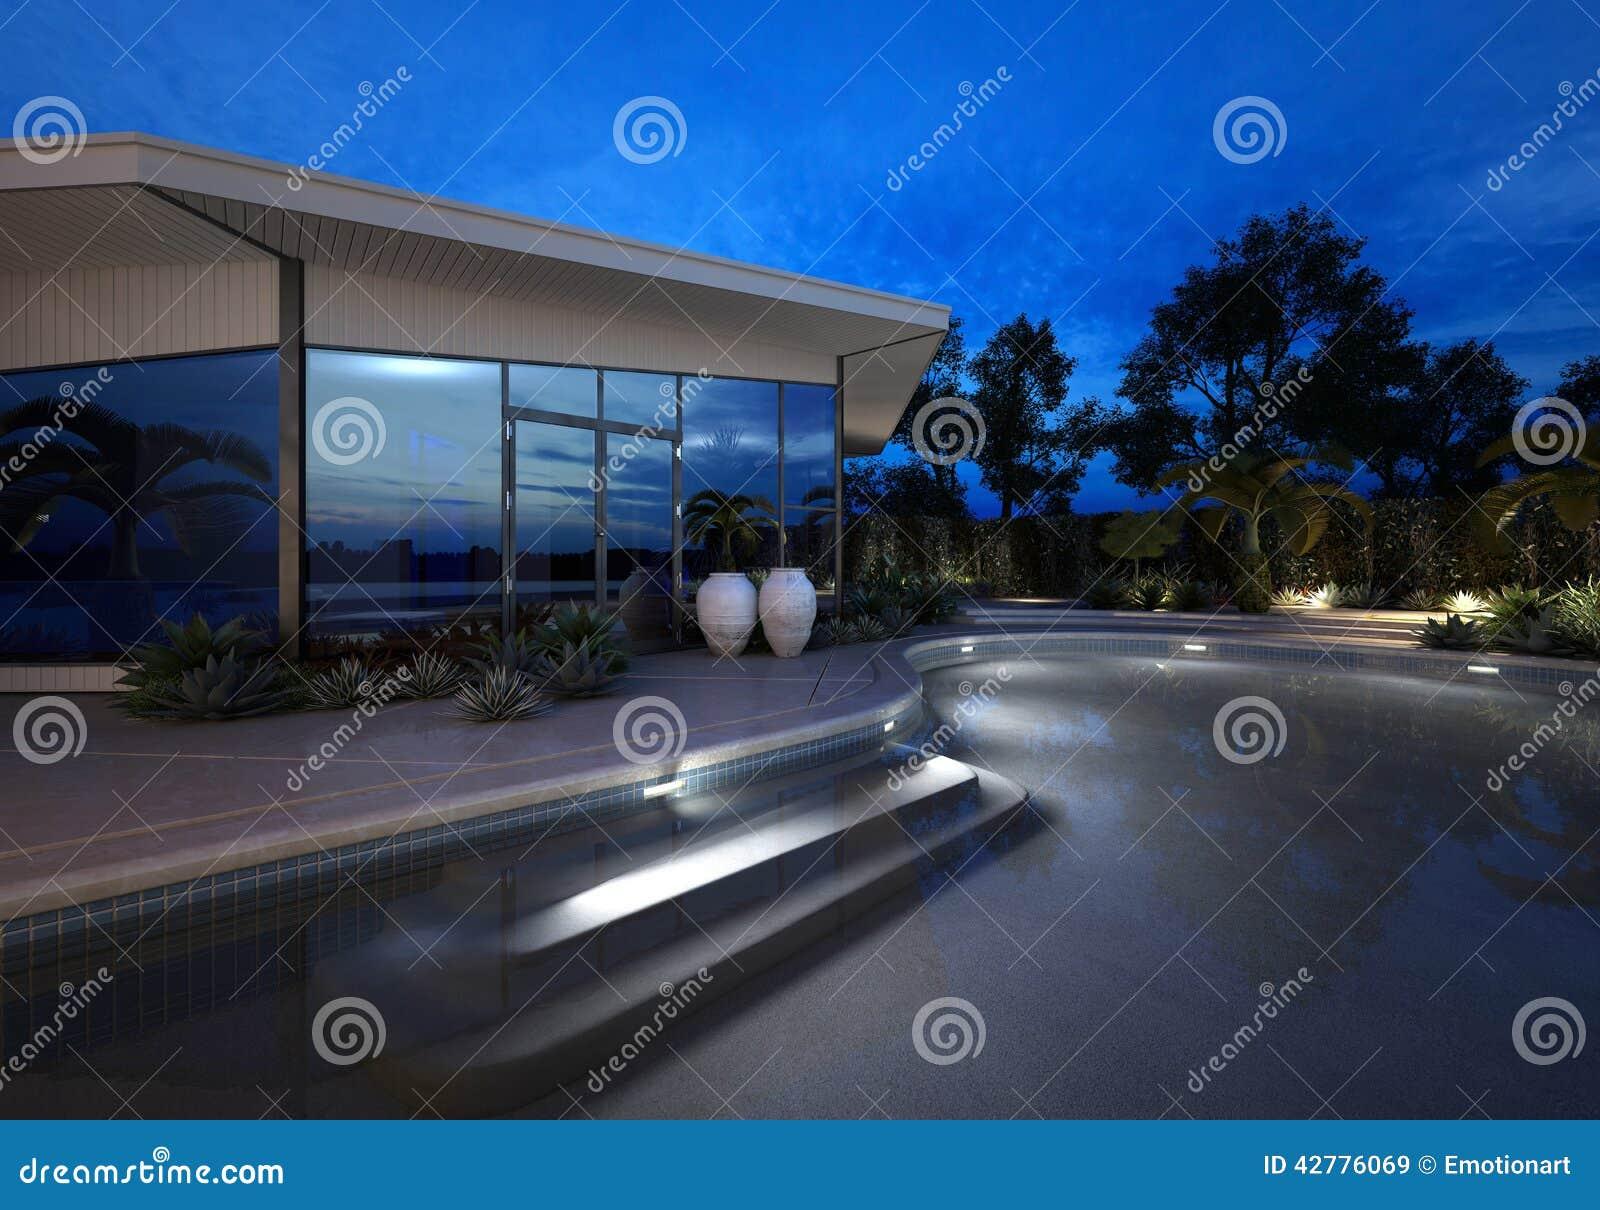 Villa de luxe la nuit avec une piscine lumineuse